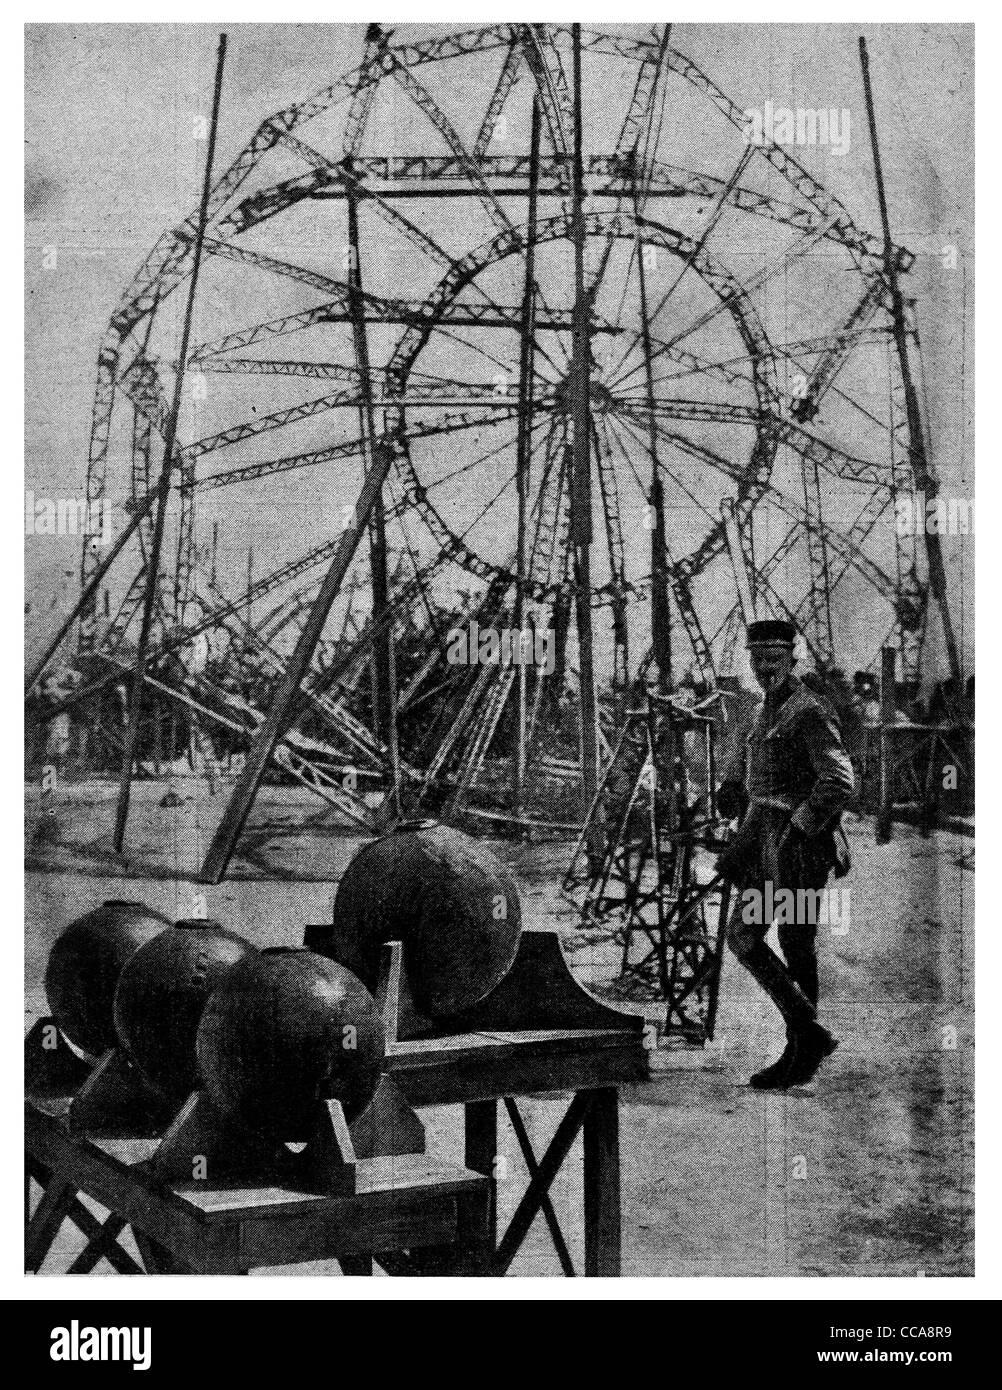 1916 Zeppelin Aluminium Rahmenarbeit umgebaut Französisch Bombe ...